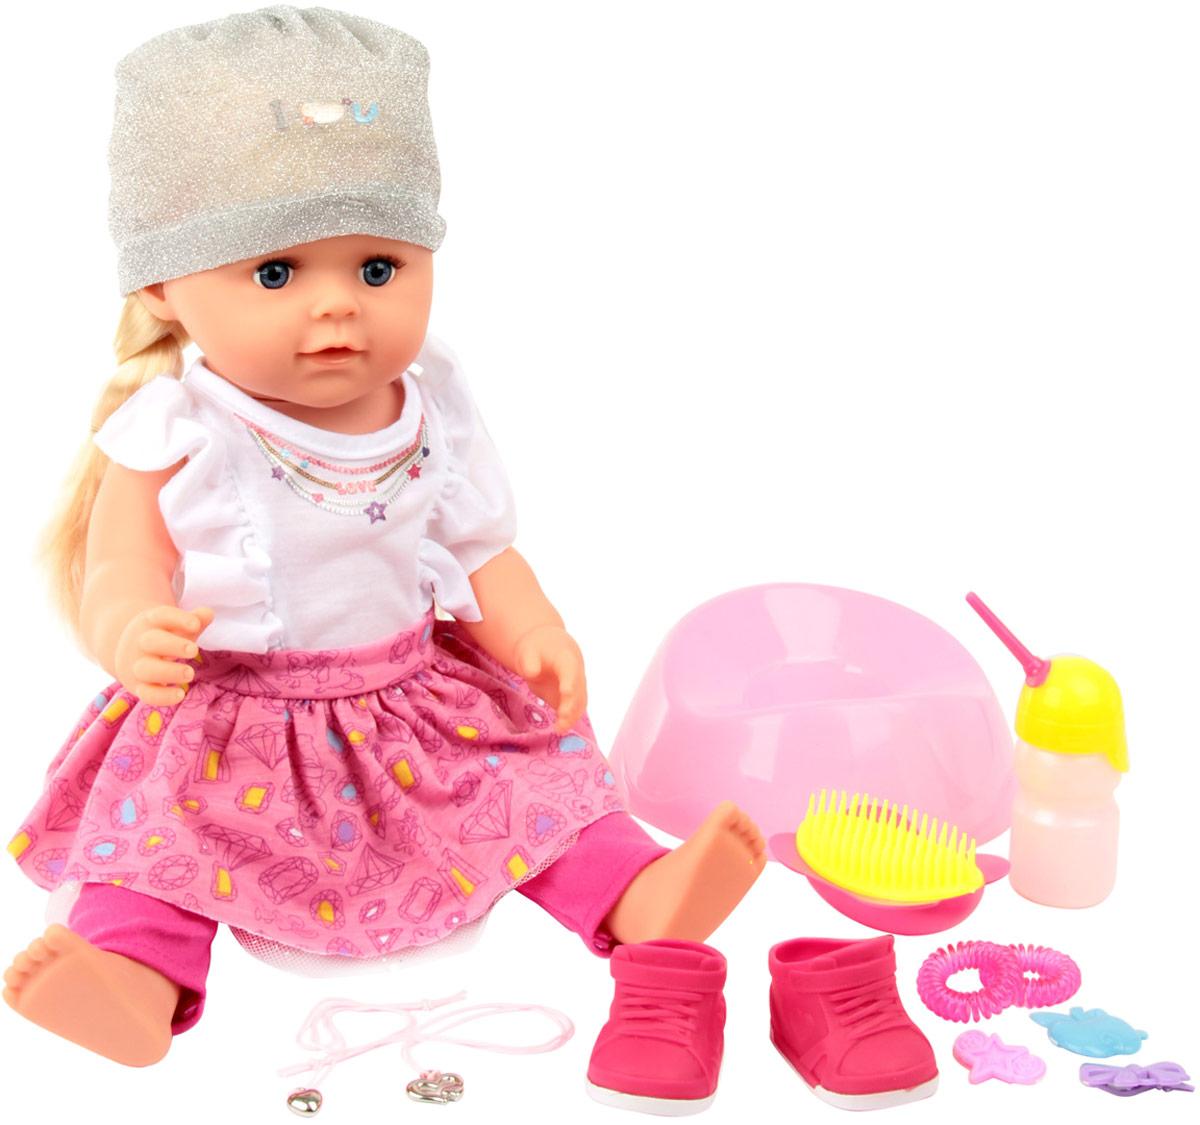 Lisa Jane Кукла Кира 46 см кукла интерактивная lisa jane mami в розовом 40 см